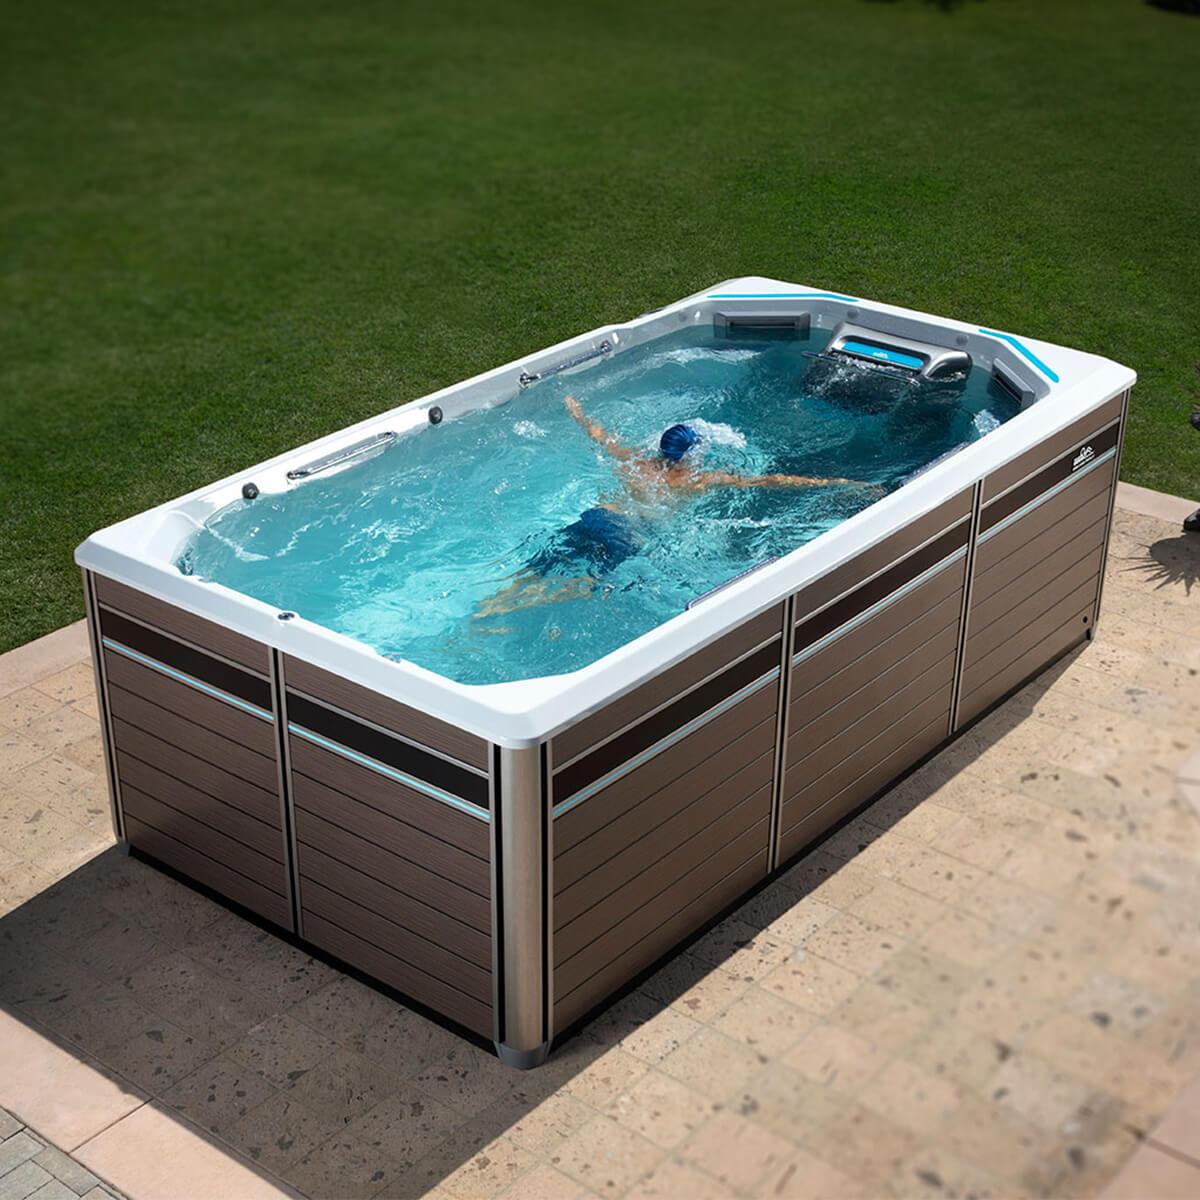 Get Swim Spa Pricing - Hot Spring Green